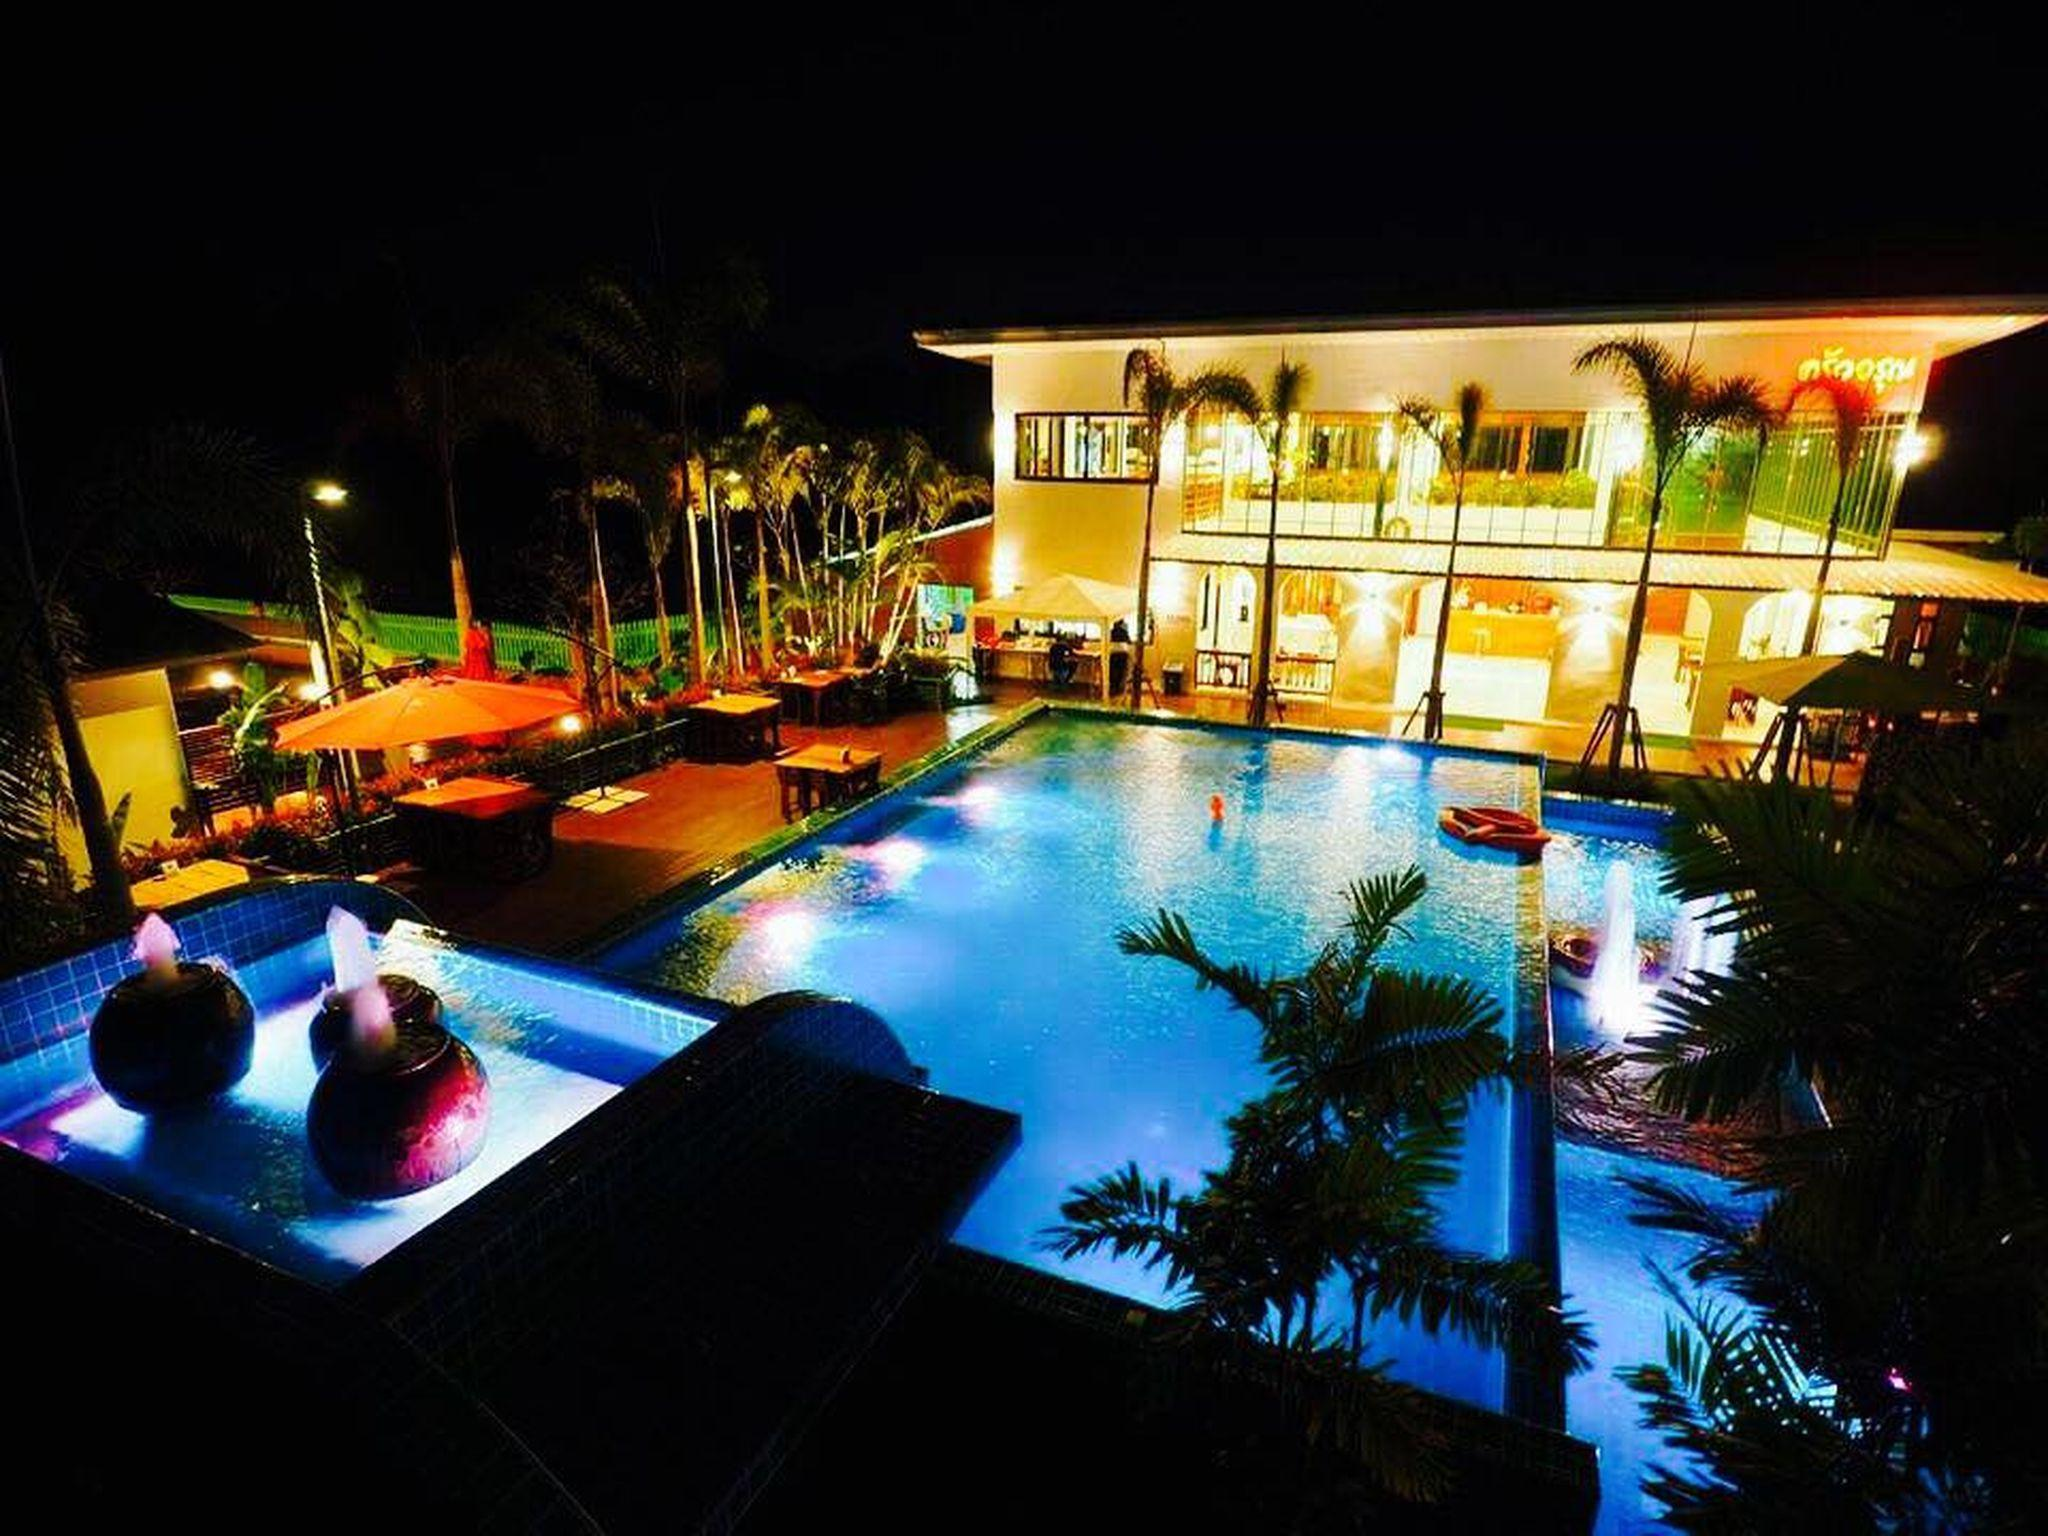 Green Terrace Resort And Restaurant